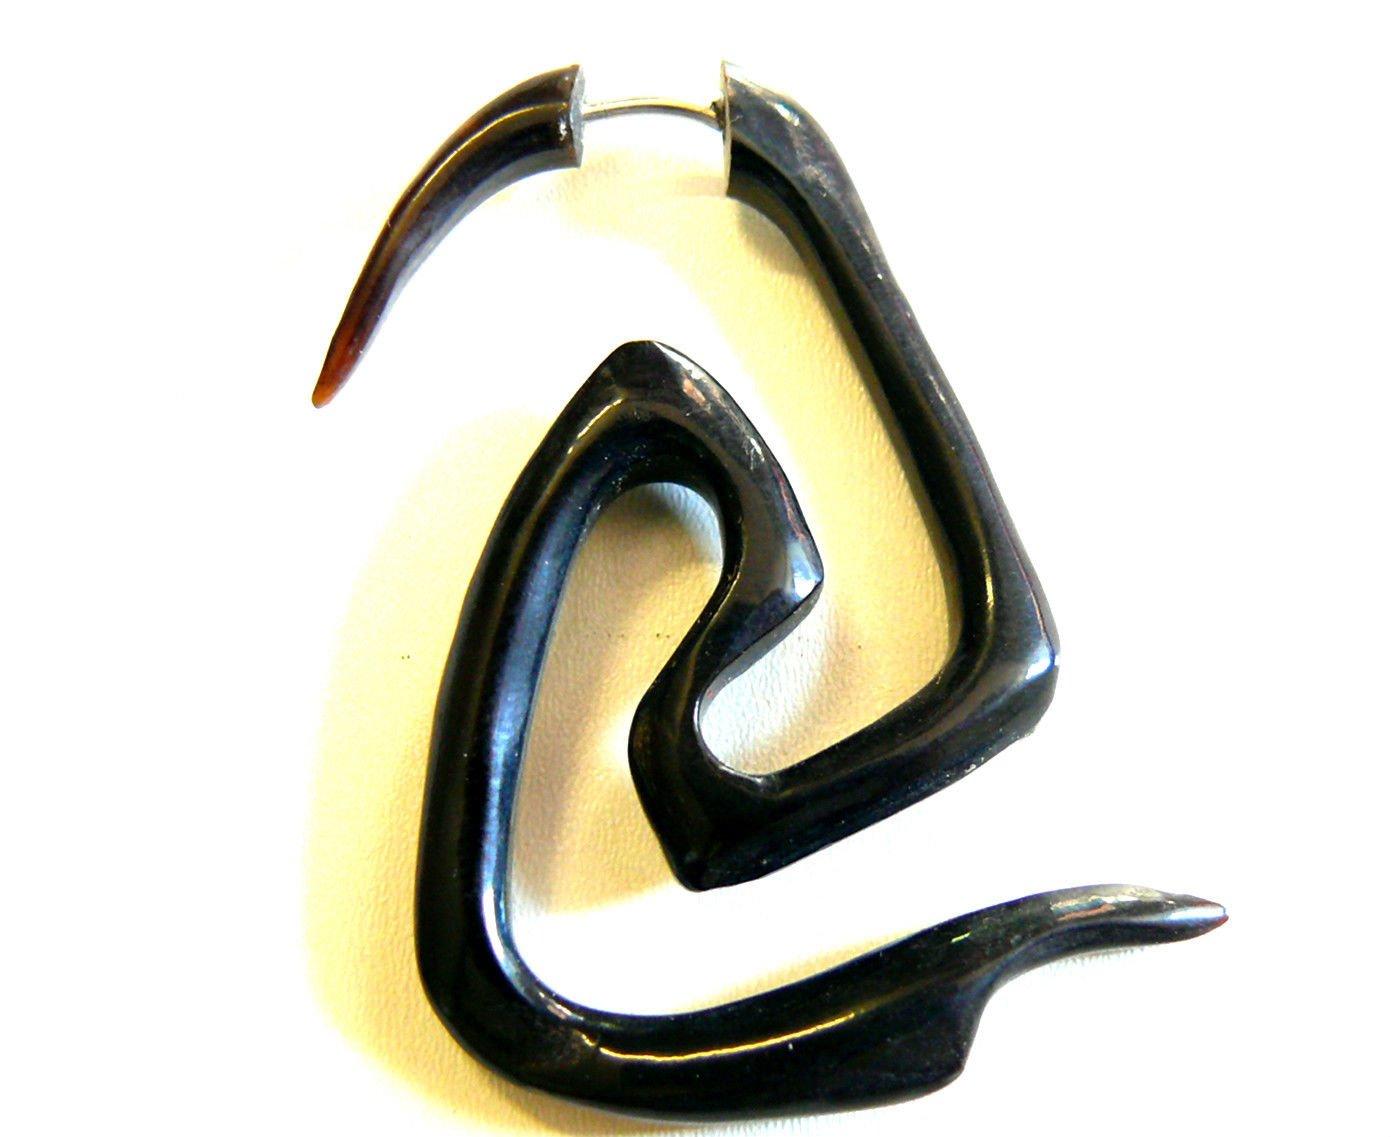 Falso Dilatador Piercing Cuerno pendiente de hueso étnica Gauge Horn Earring: Amazon.es: Hogar